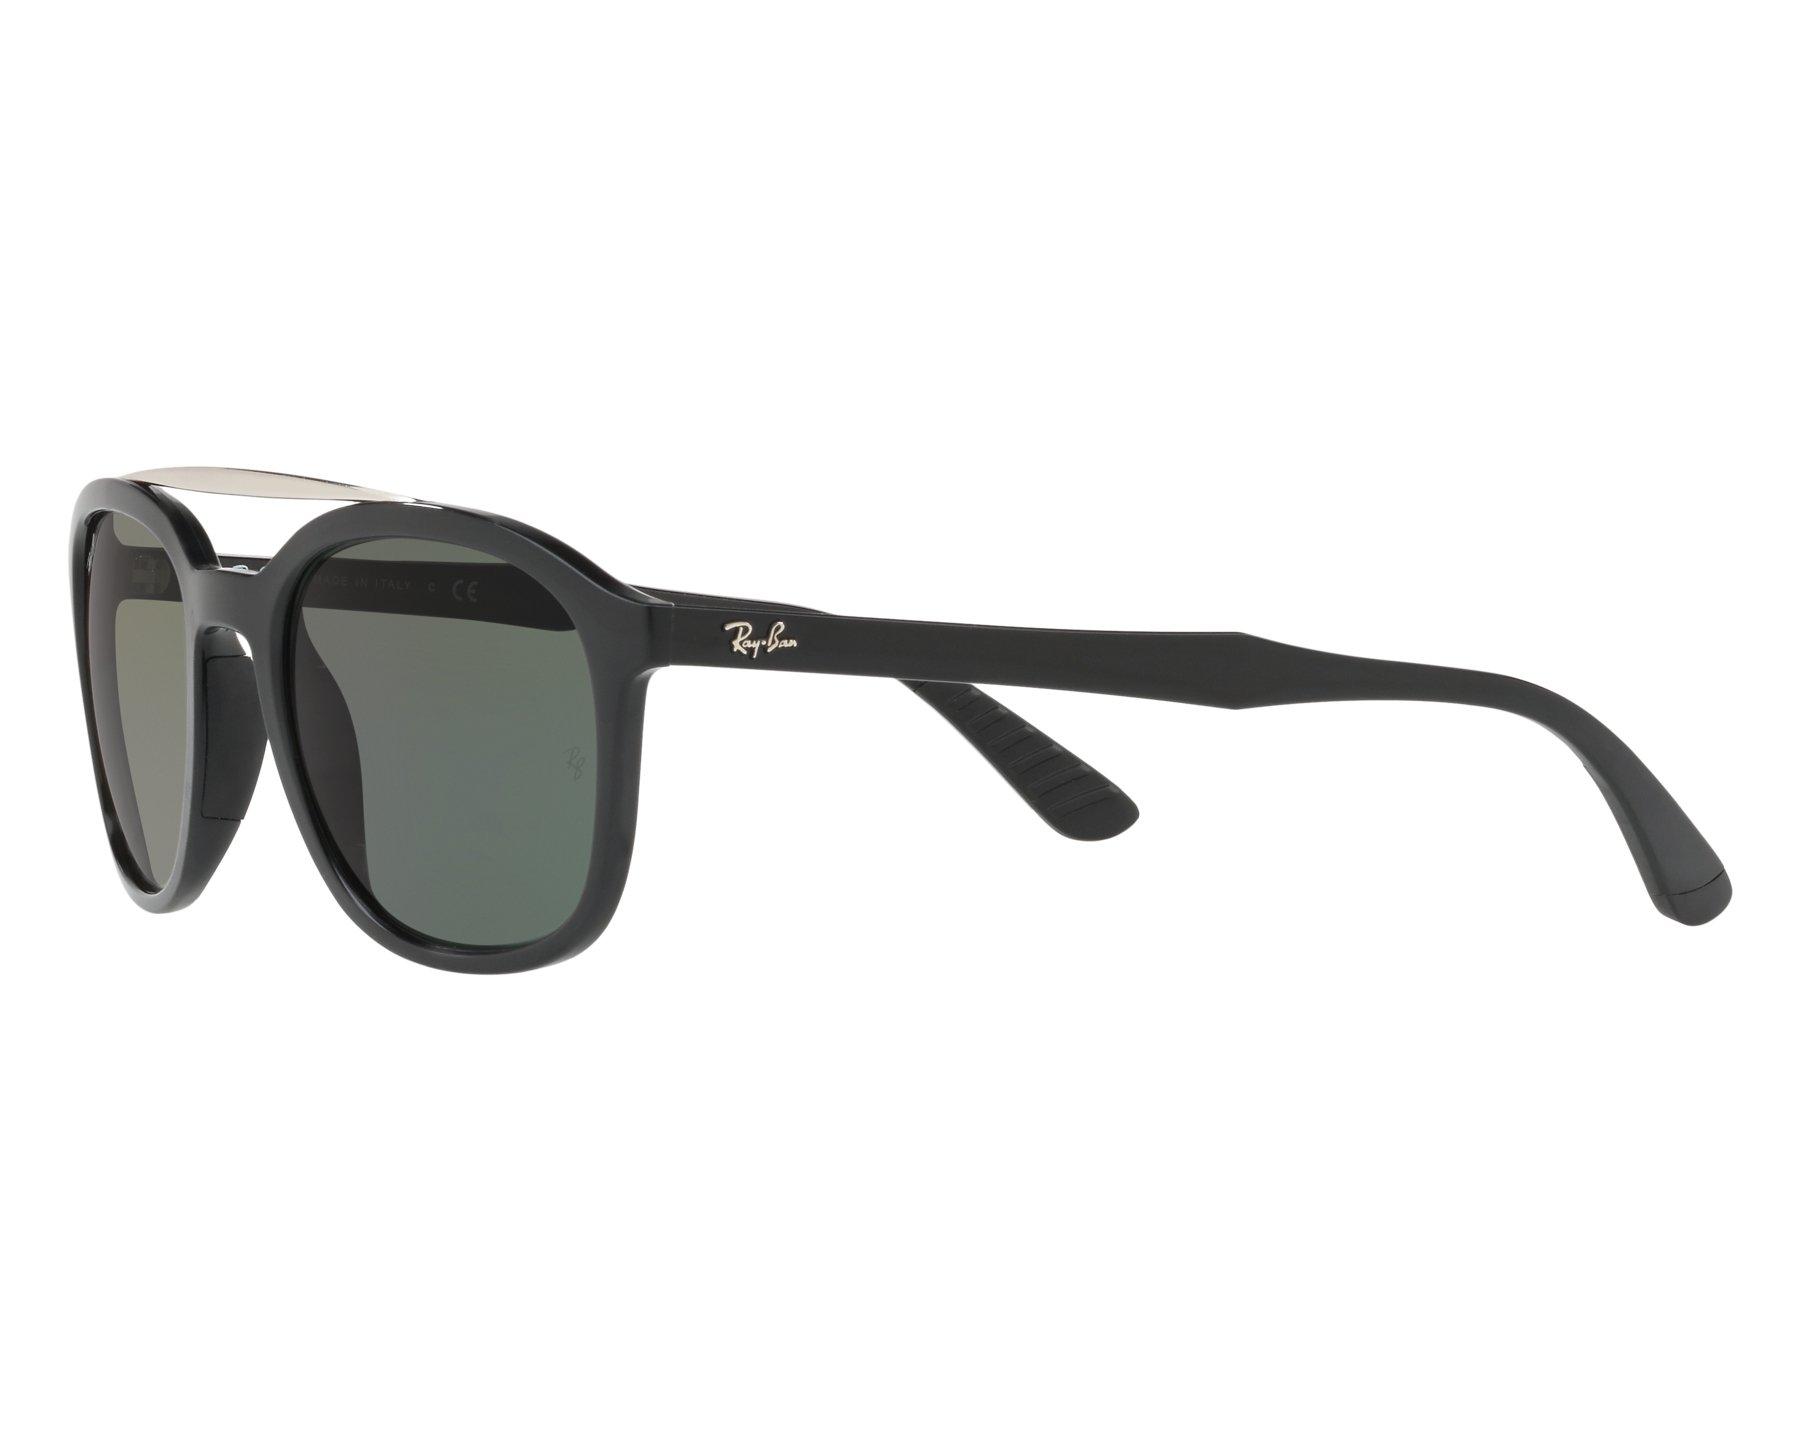 d9f3b1606d Sunglasses Ray-Ban RB-4290 601 71 53-21 Black Silver 360